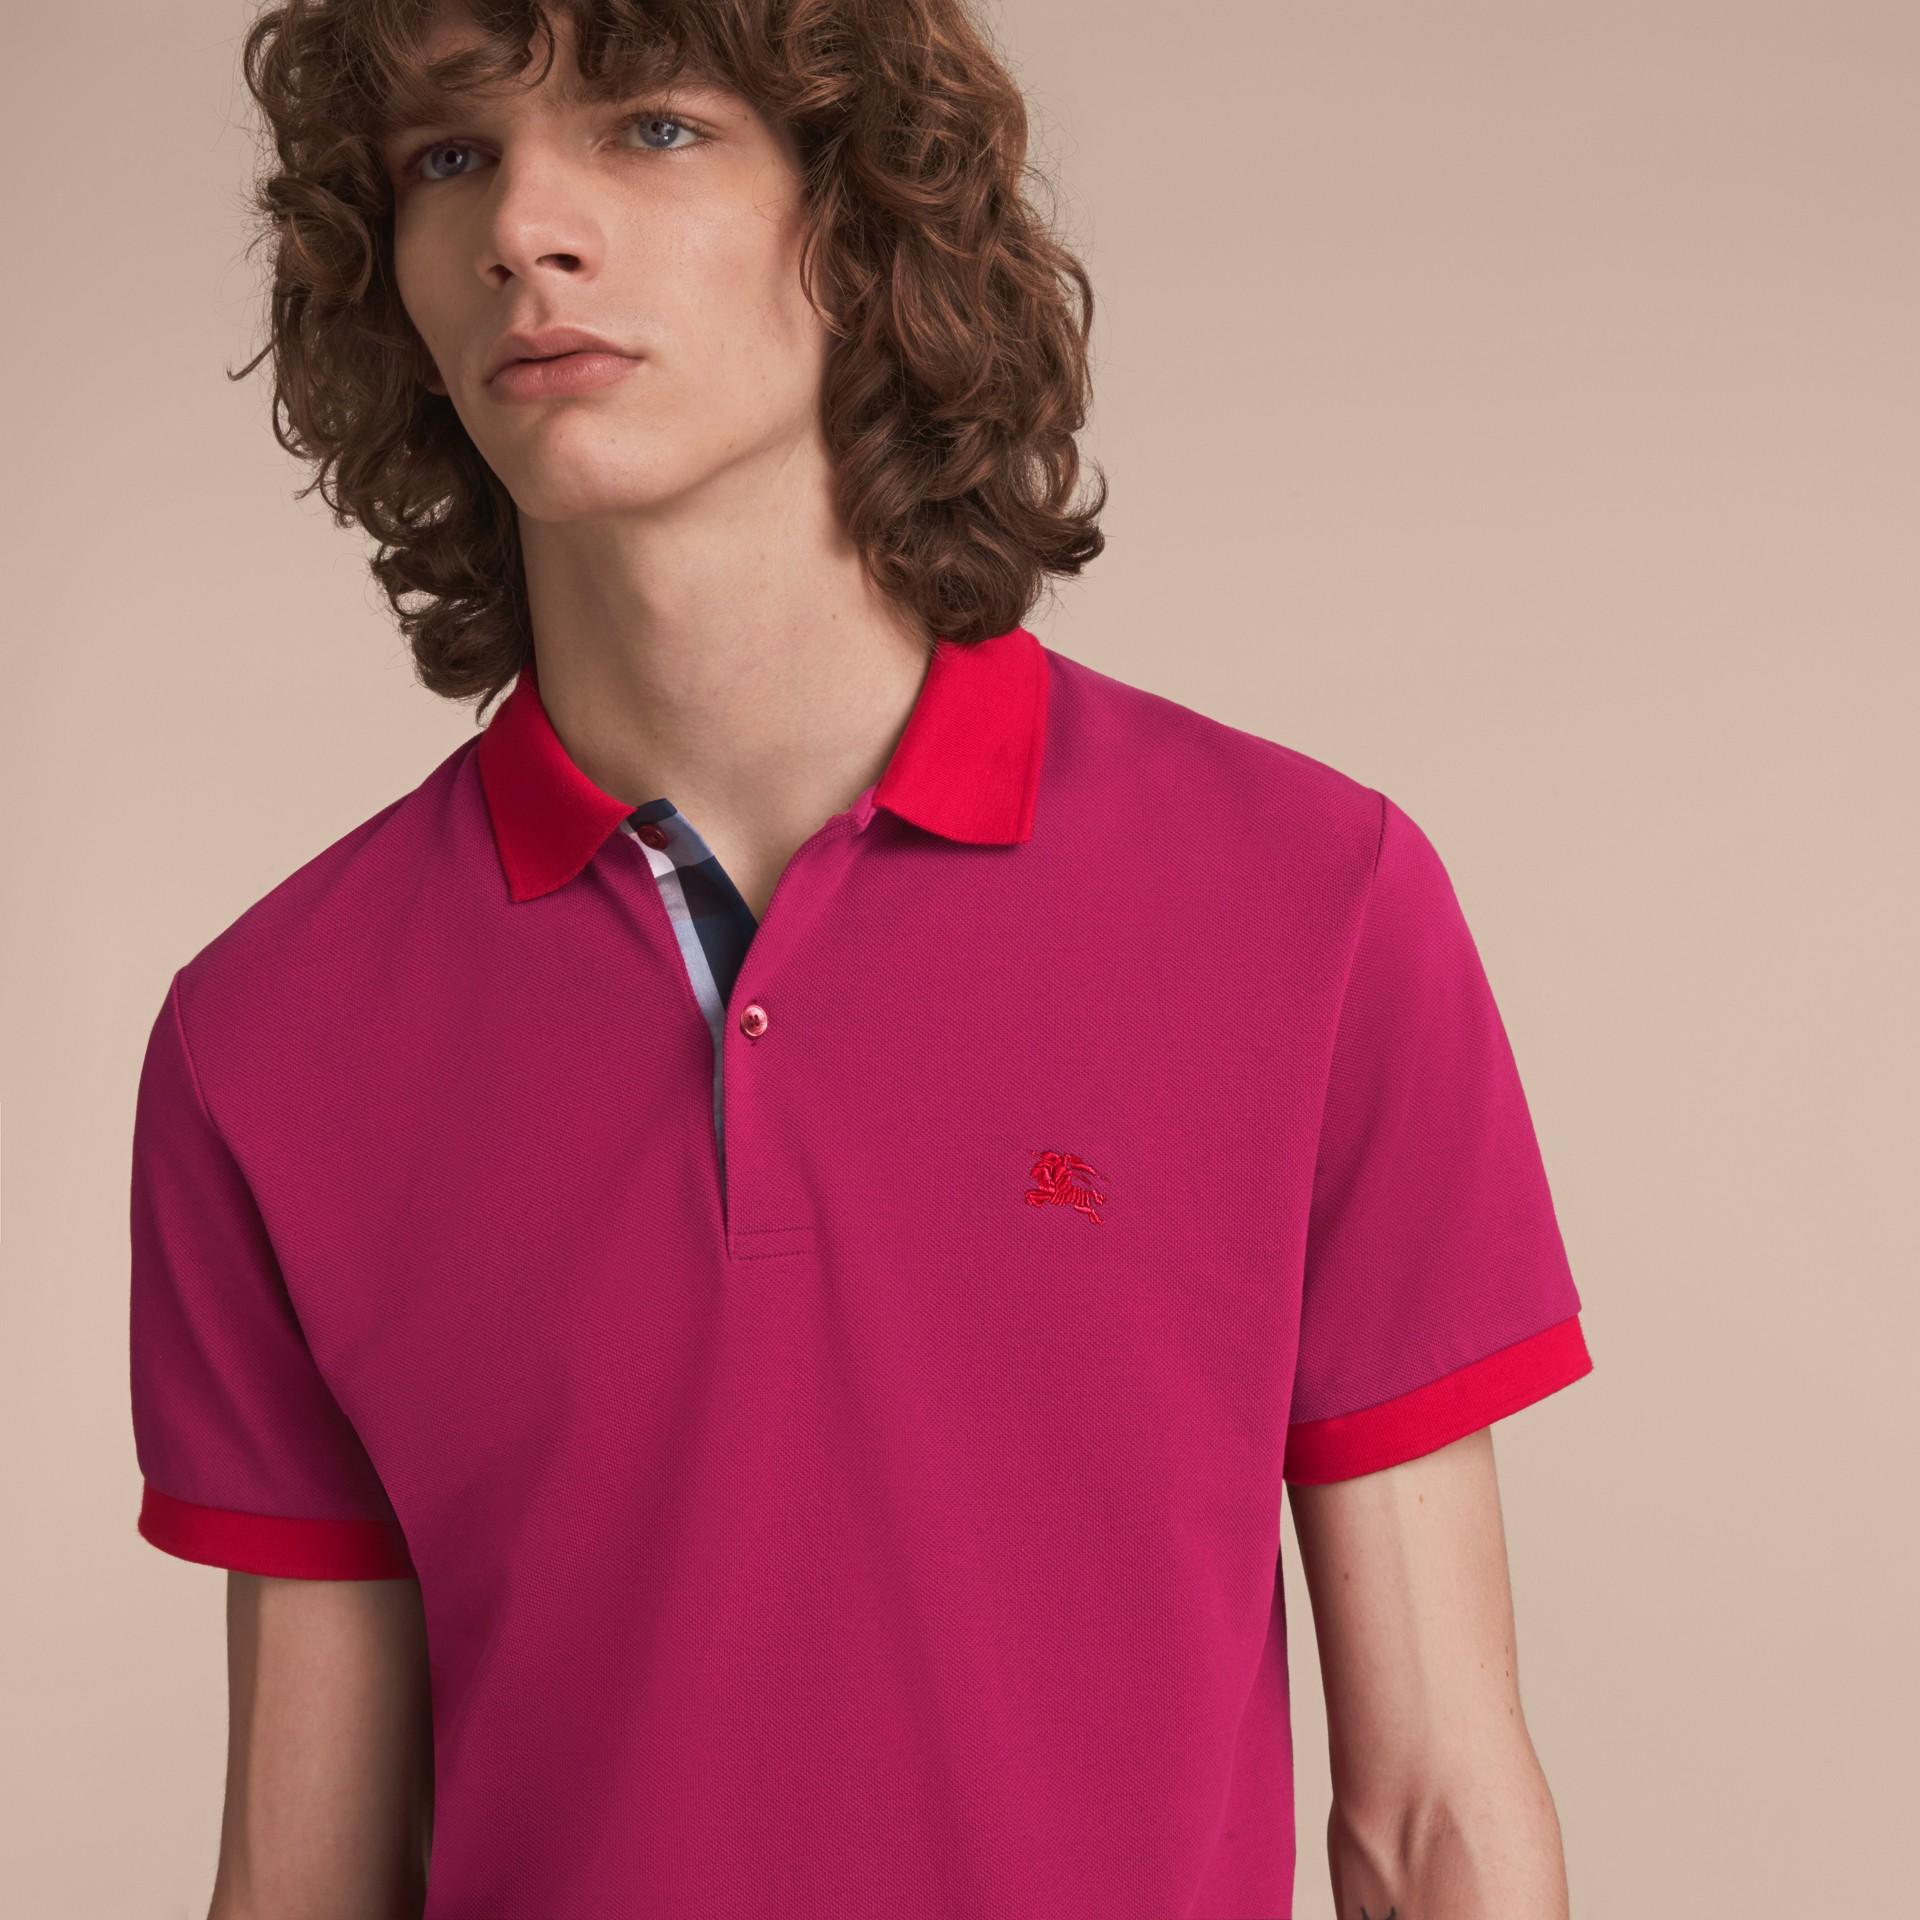 Two-tone Check Placket Cotton Piqué Polo Shirt Raspberry Sorbet - gallery image 5